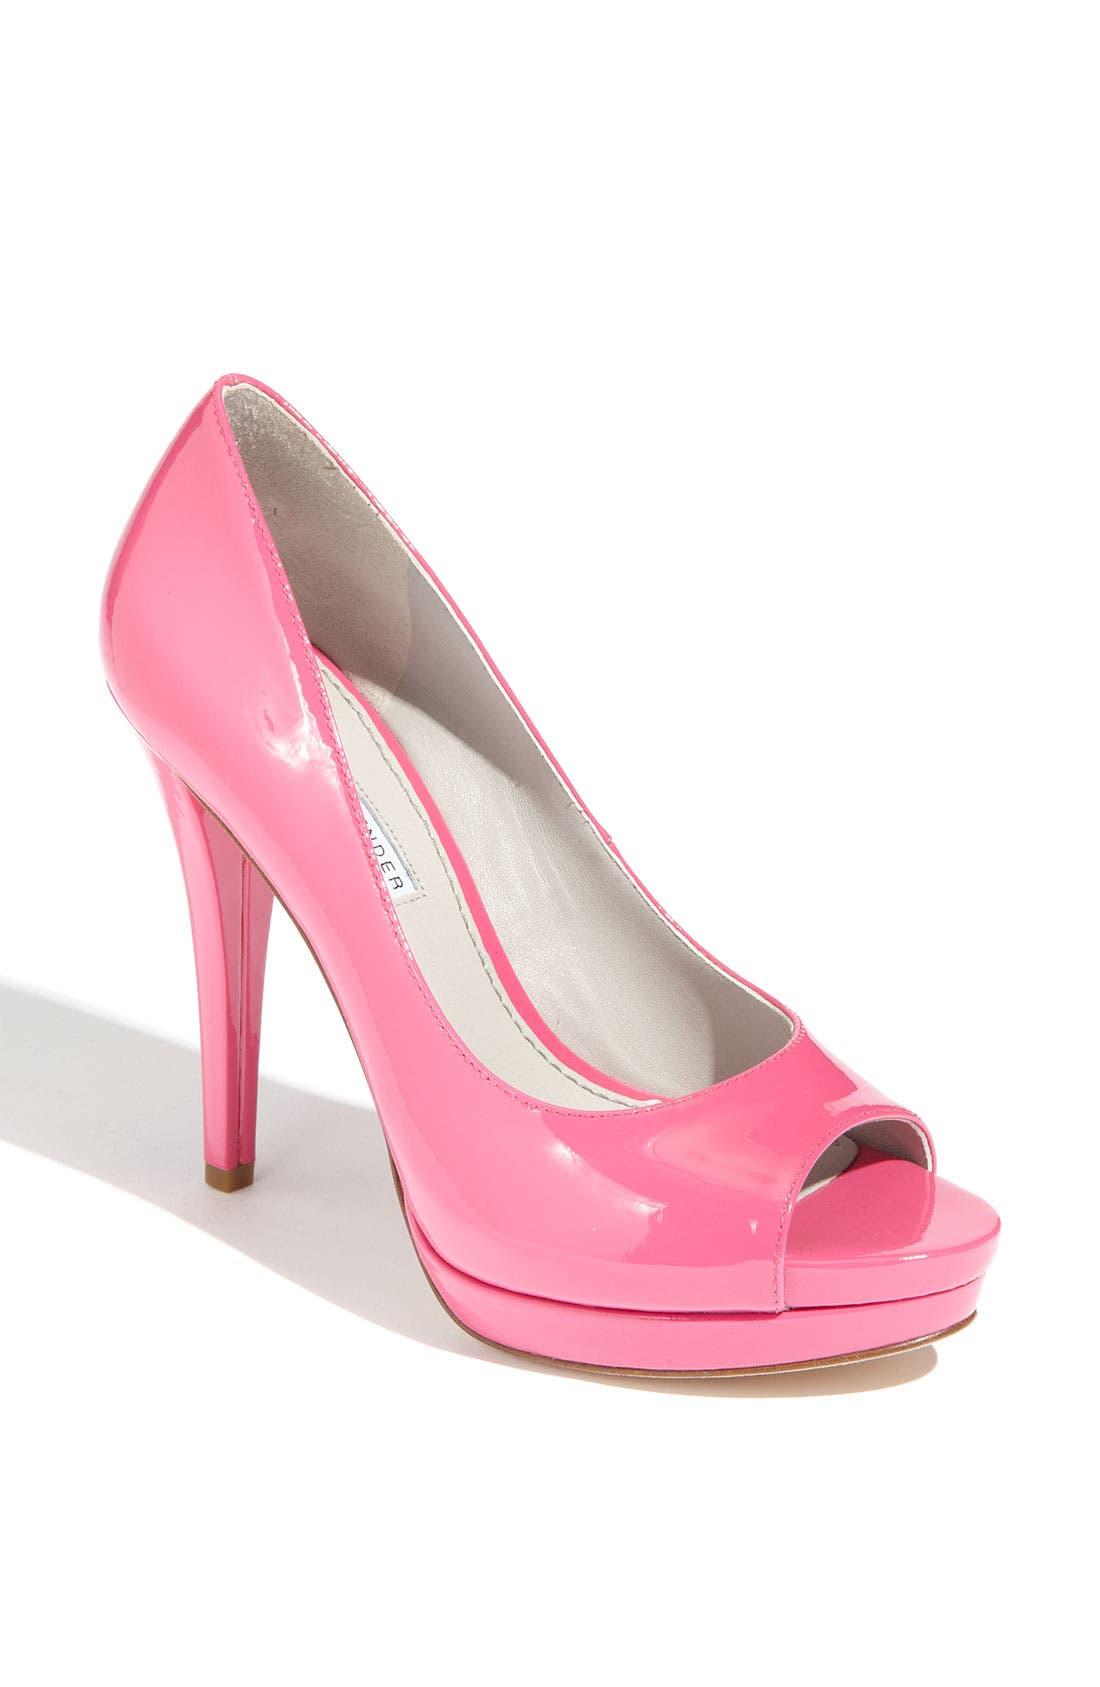 Alternate Image 1 Selected - Vera Wang Footwear 'Selima' Pump